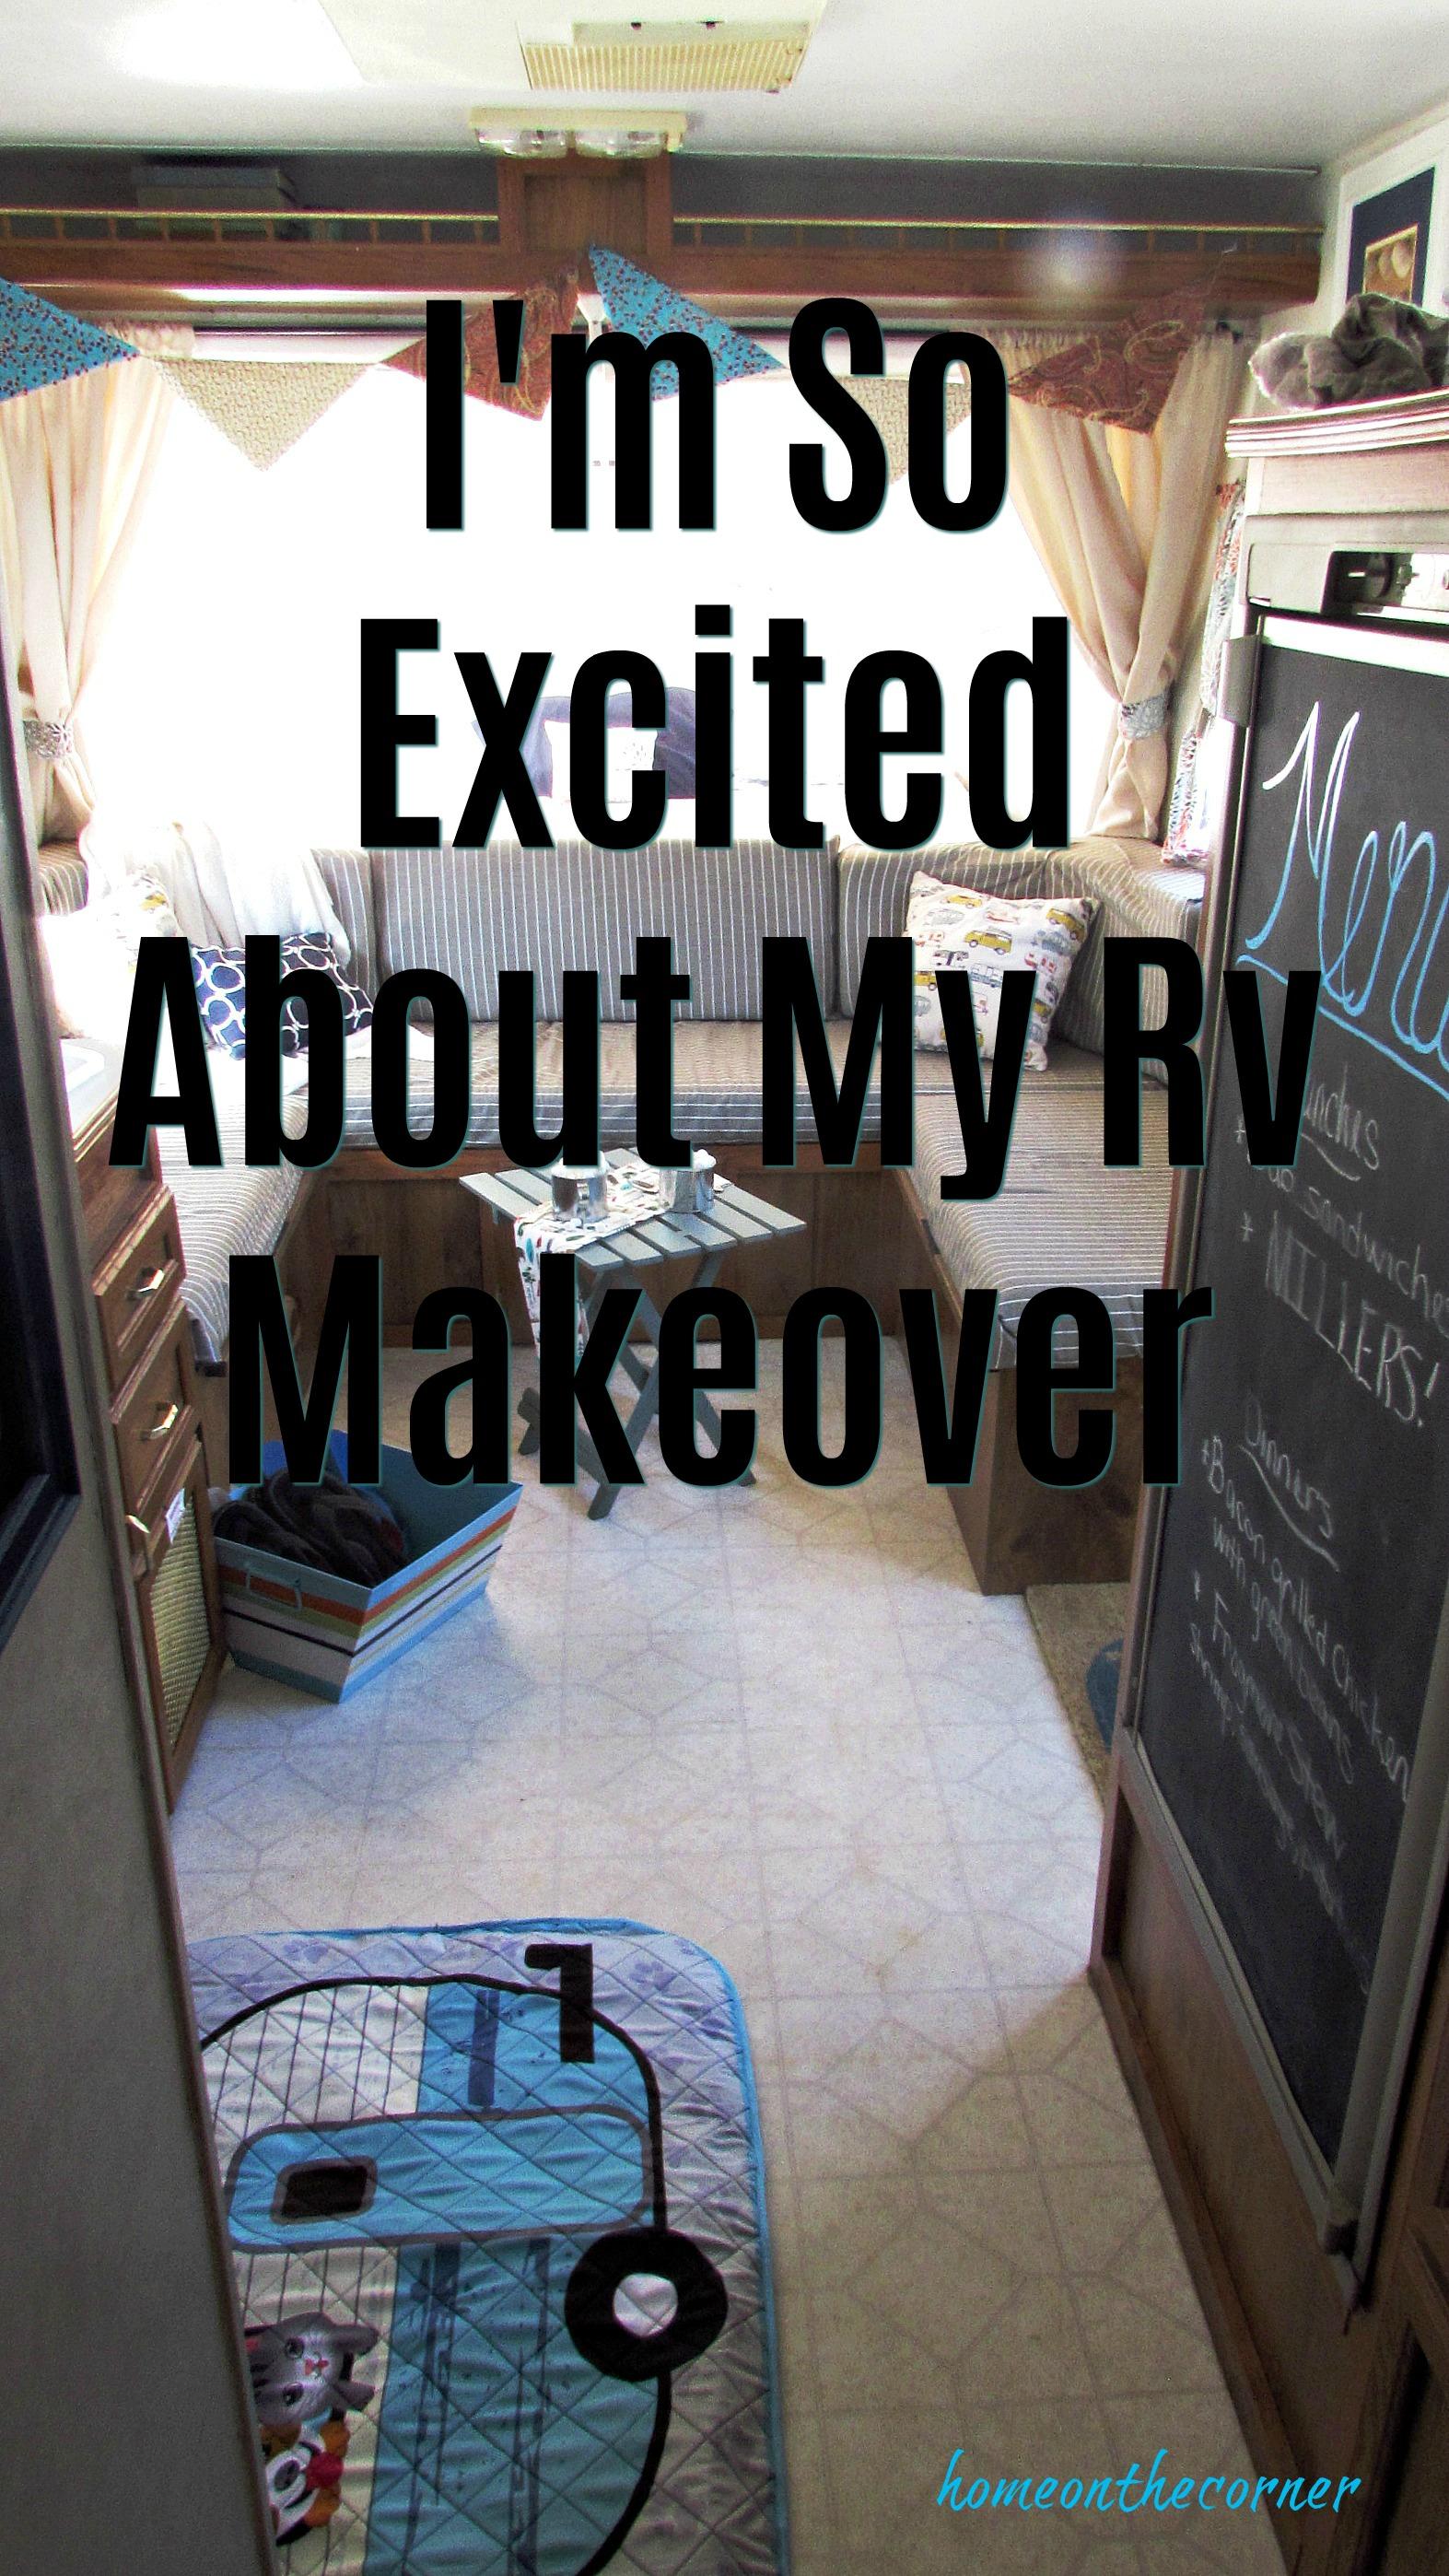 rv makeover title